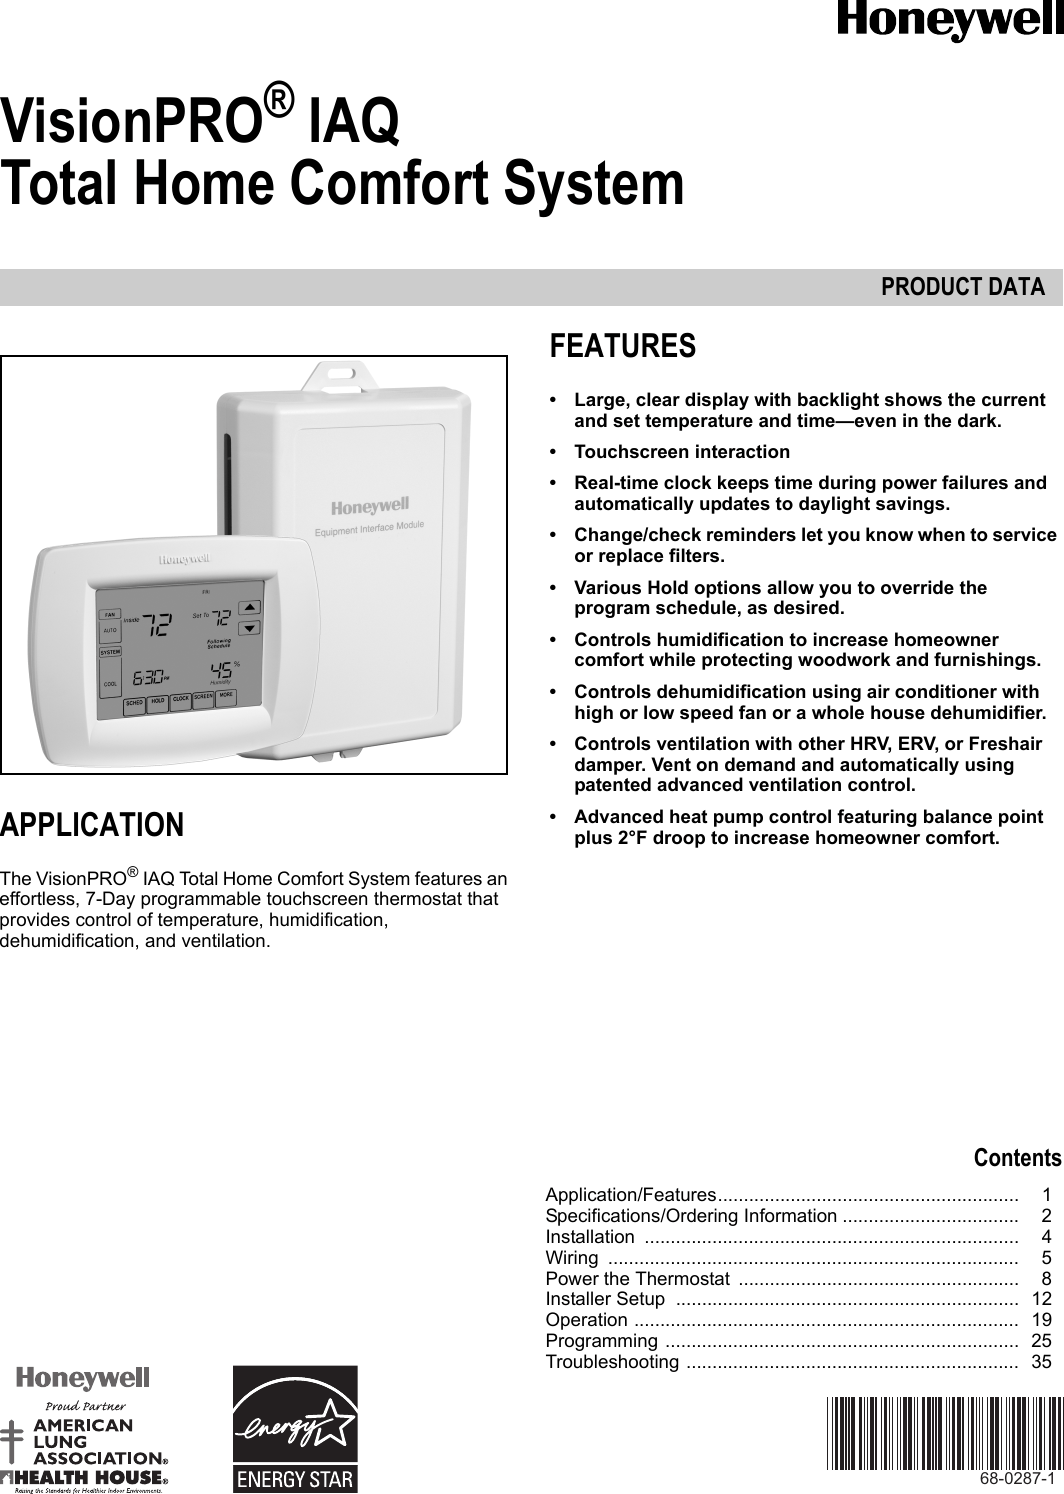 Honeywell Visionpro Iaq Wiring Diagram 38 Auto For